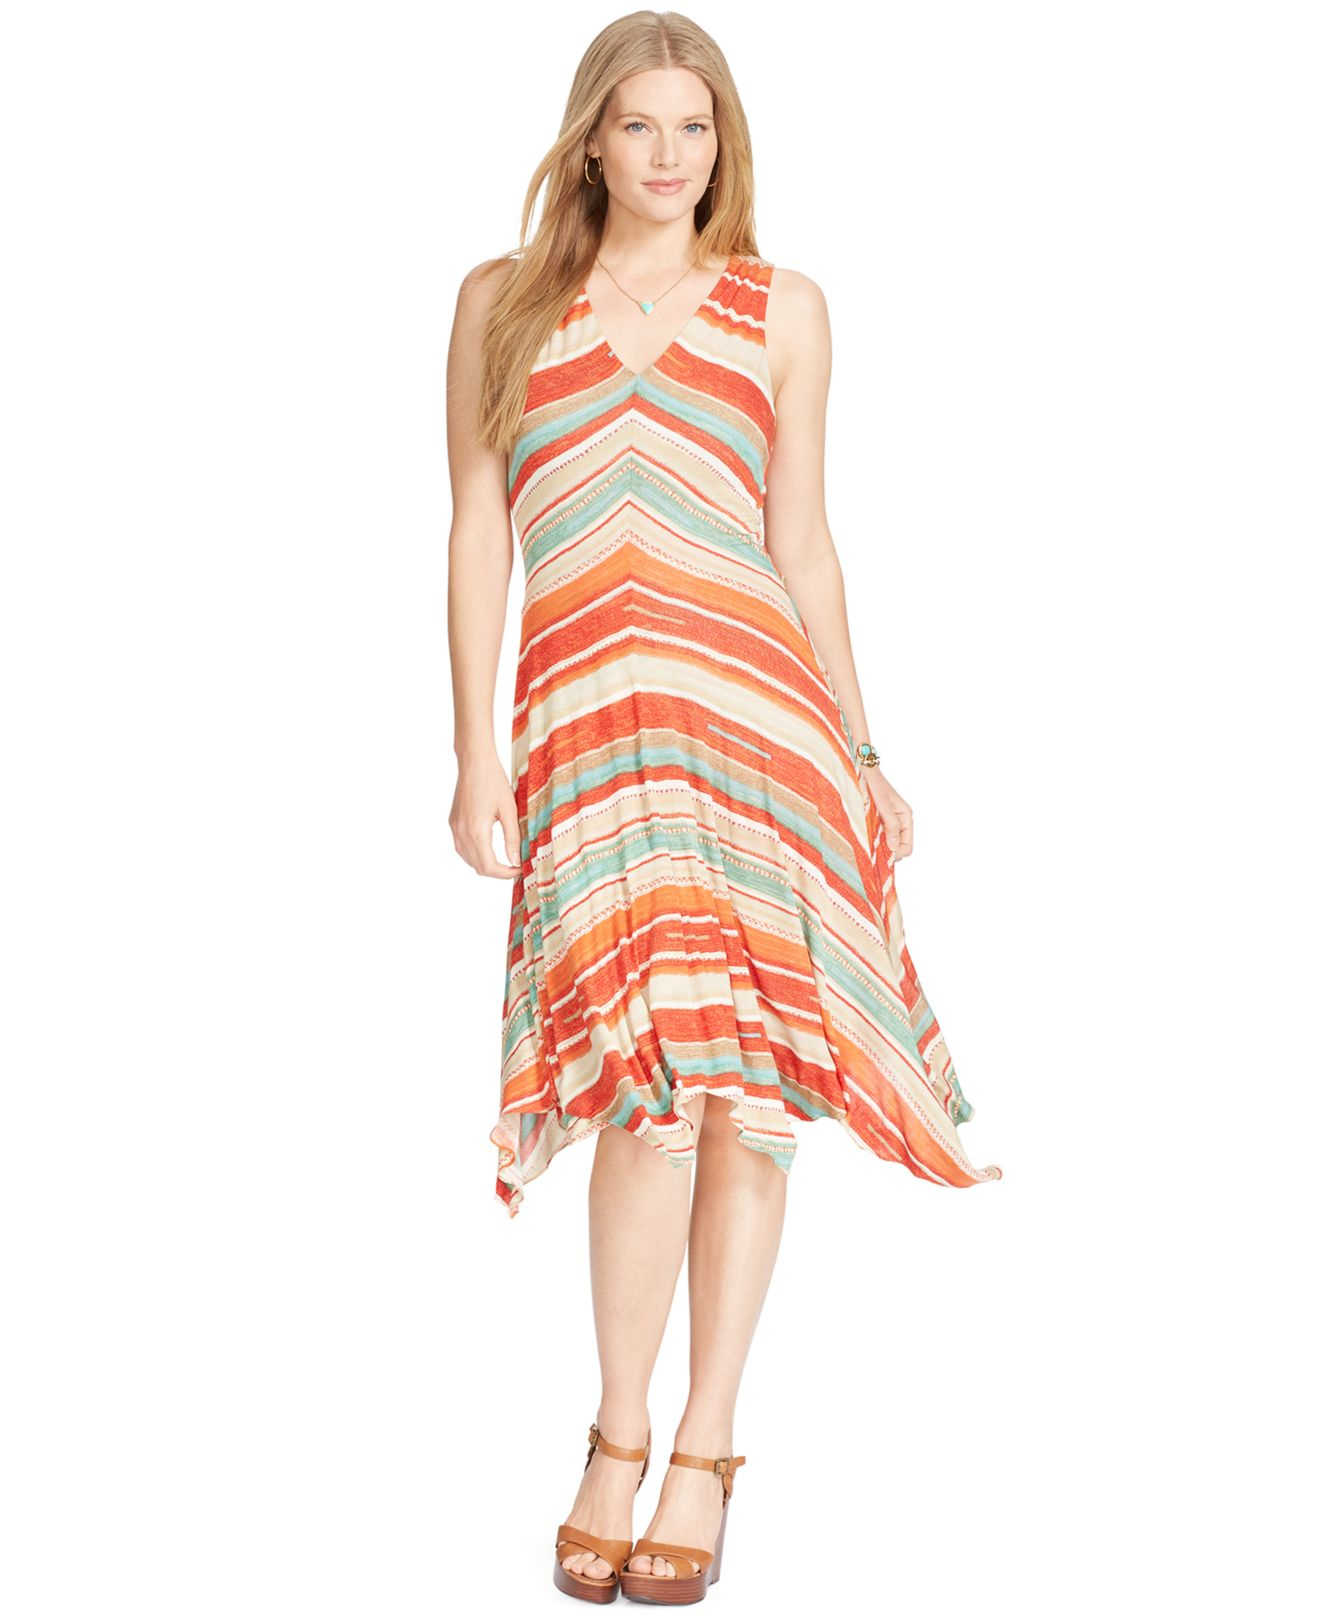 Waterfront outing dress fashion